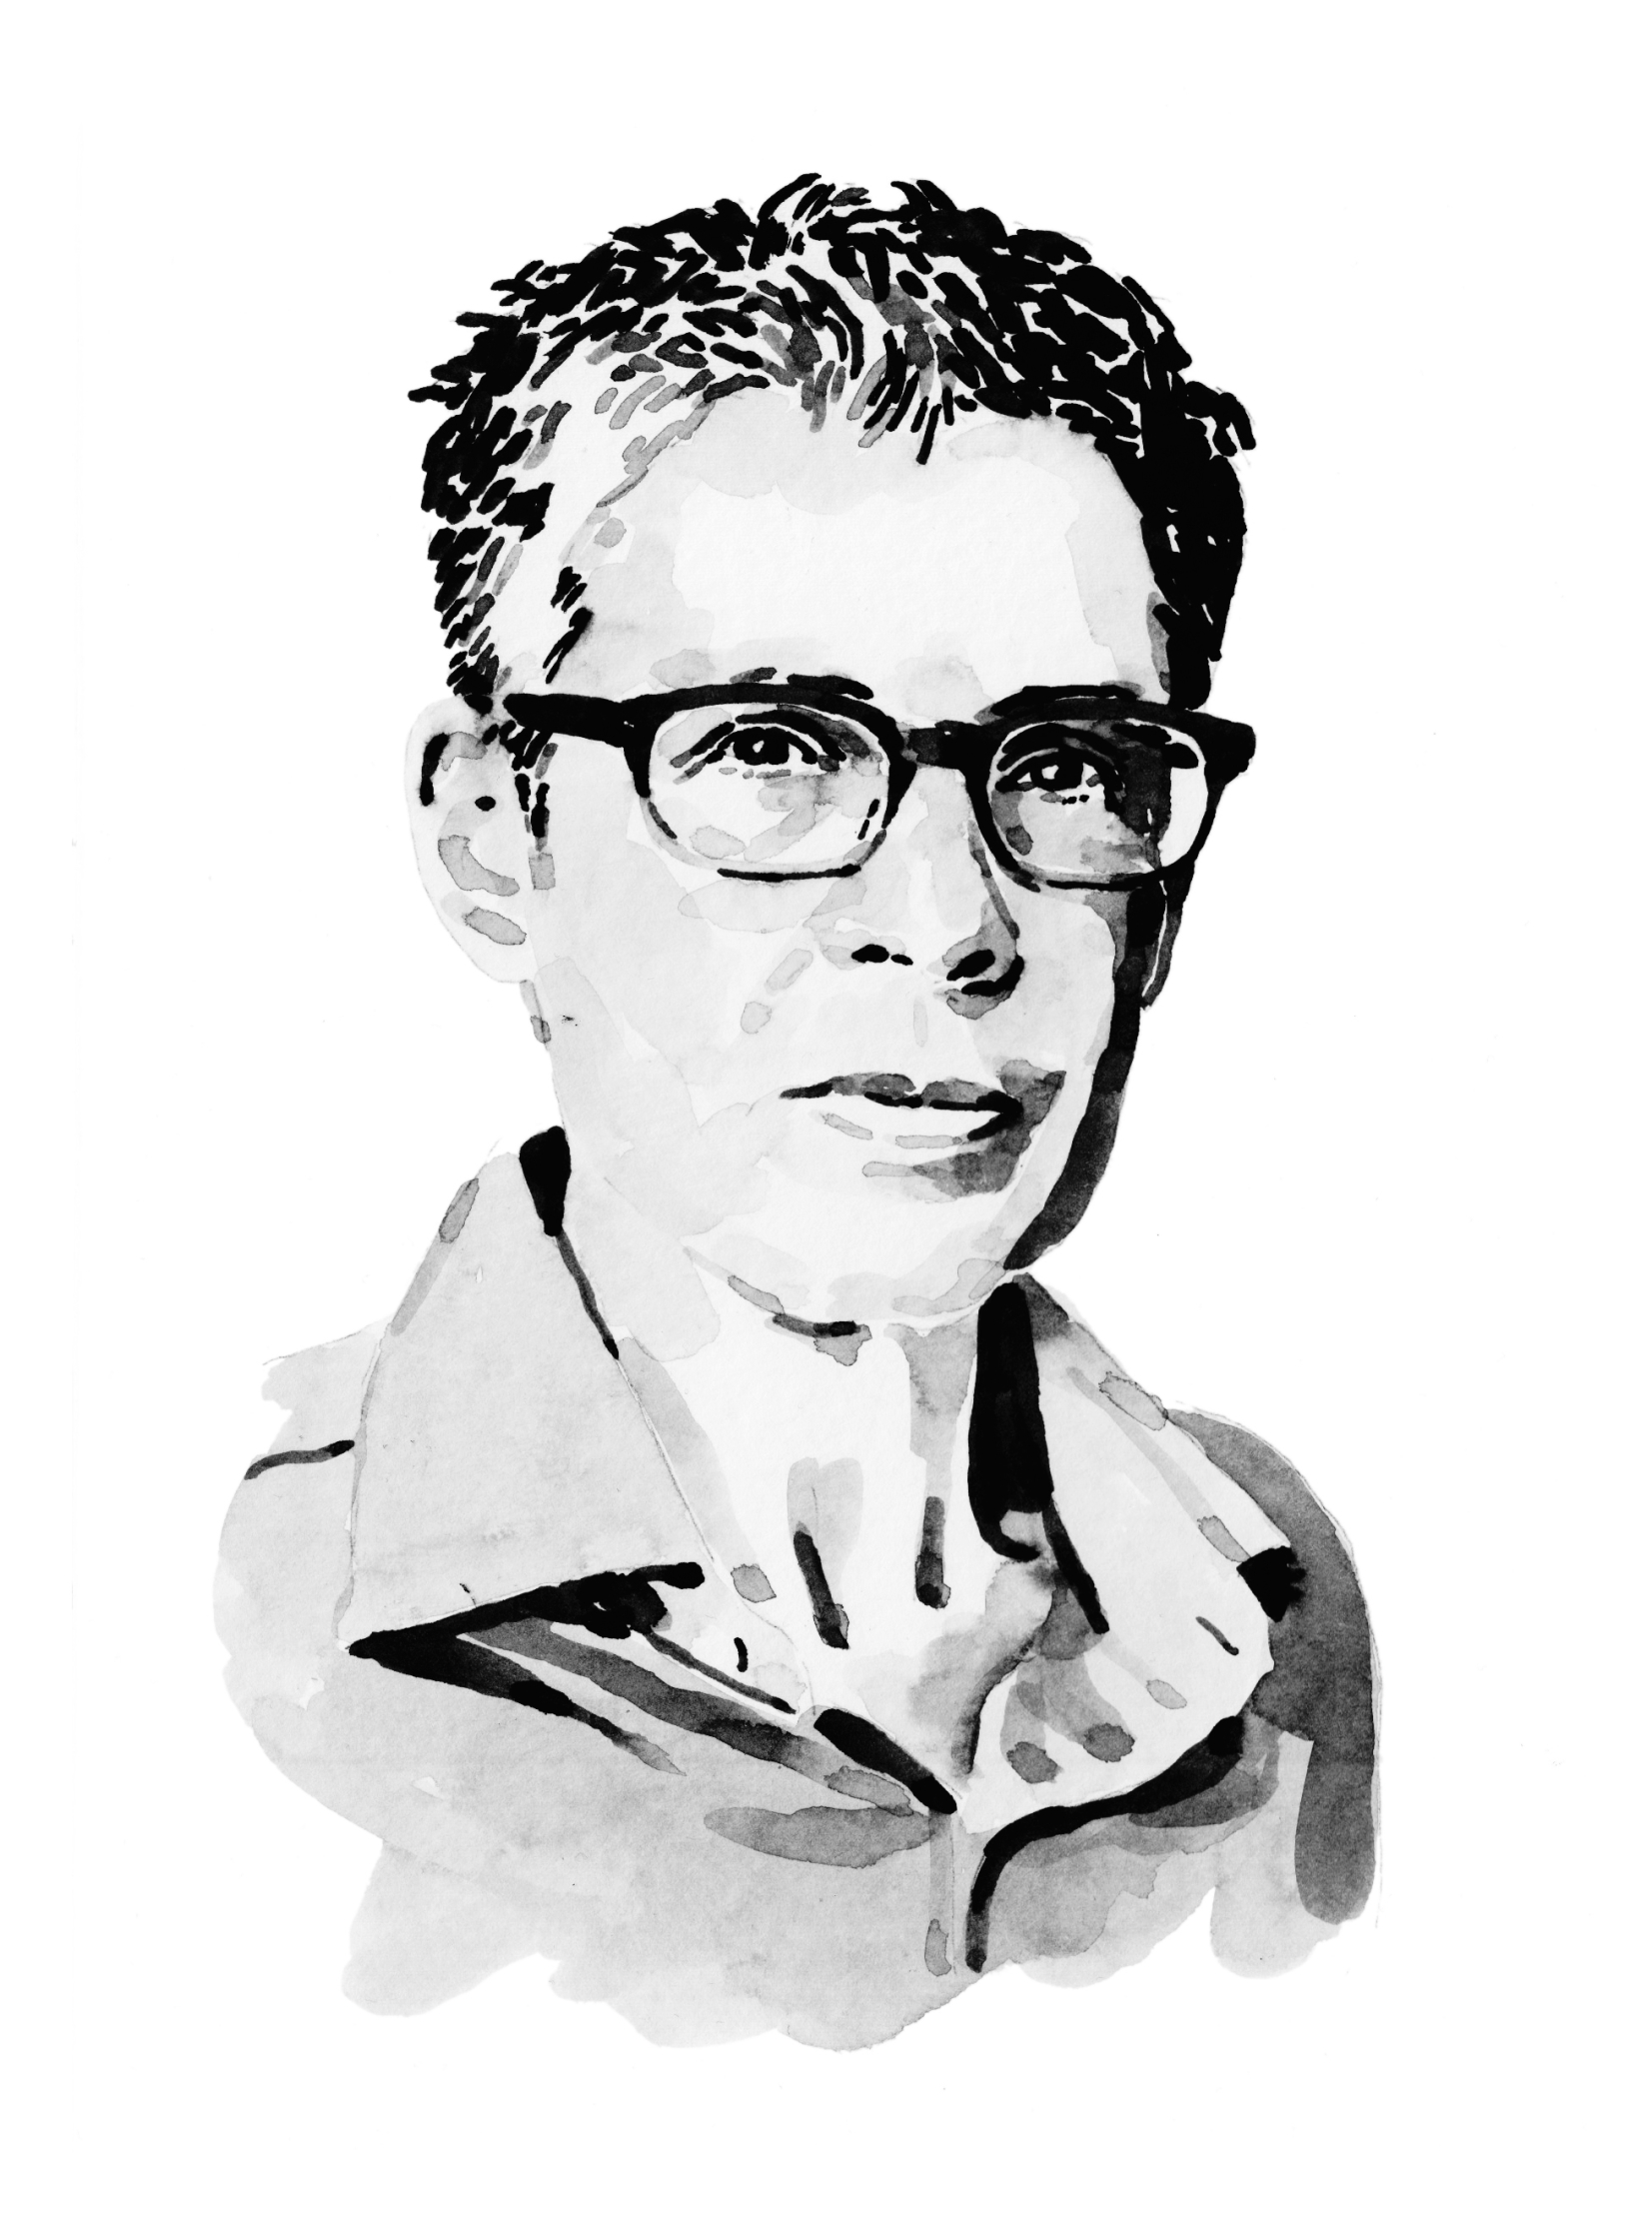 The_Economist_'Jackie_Stevens'_Watercolour.jpg